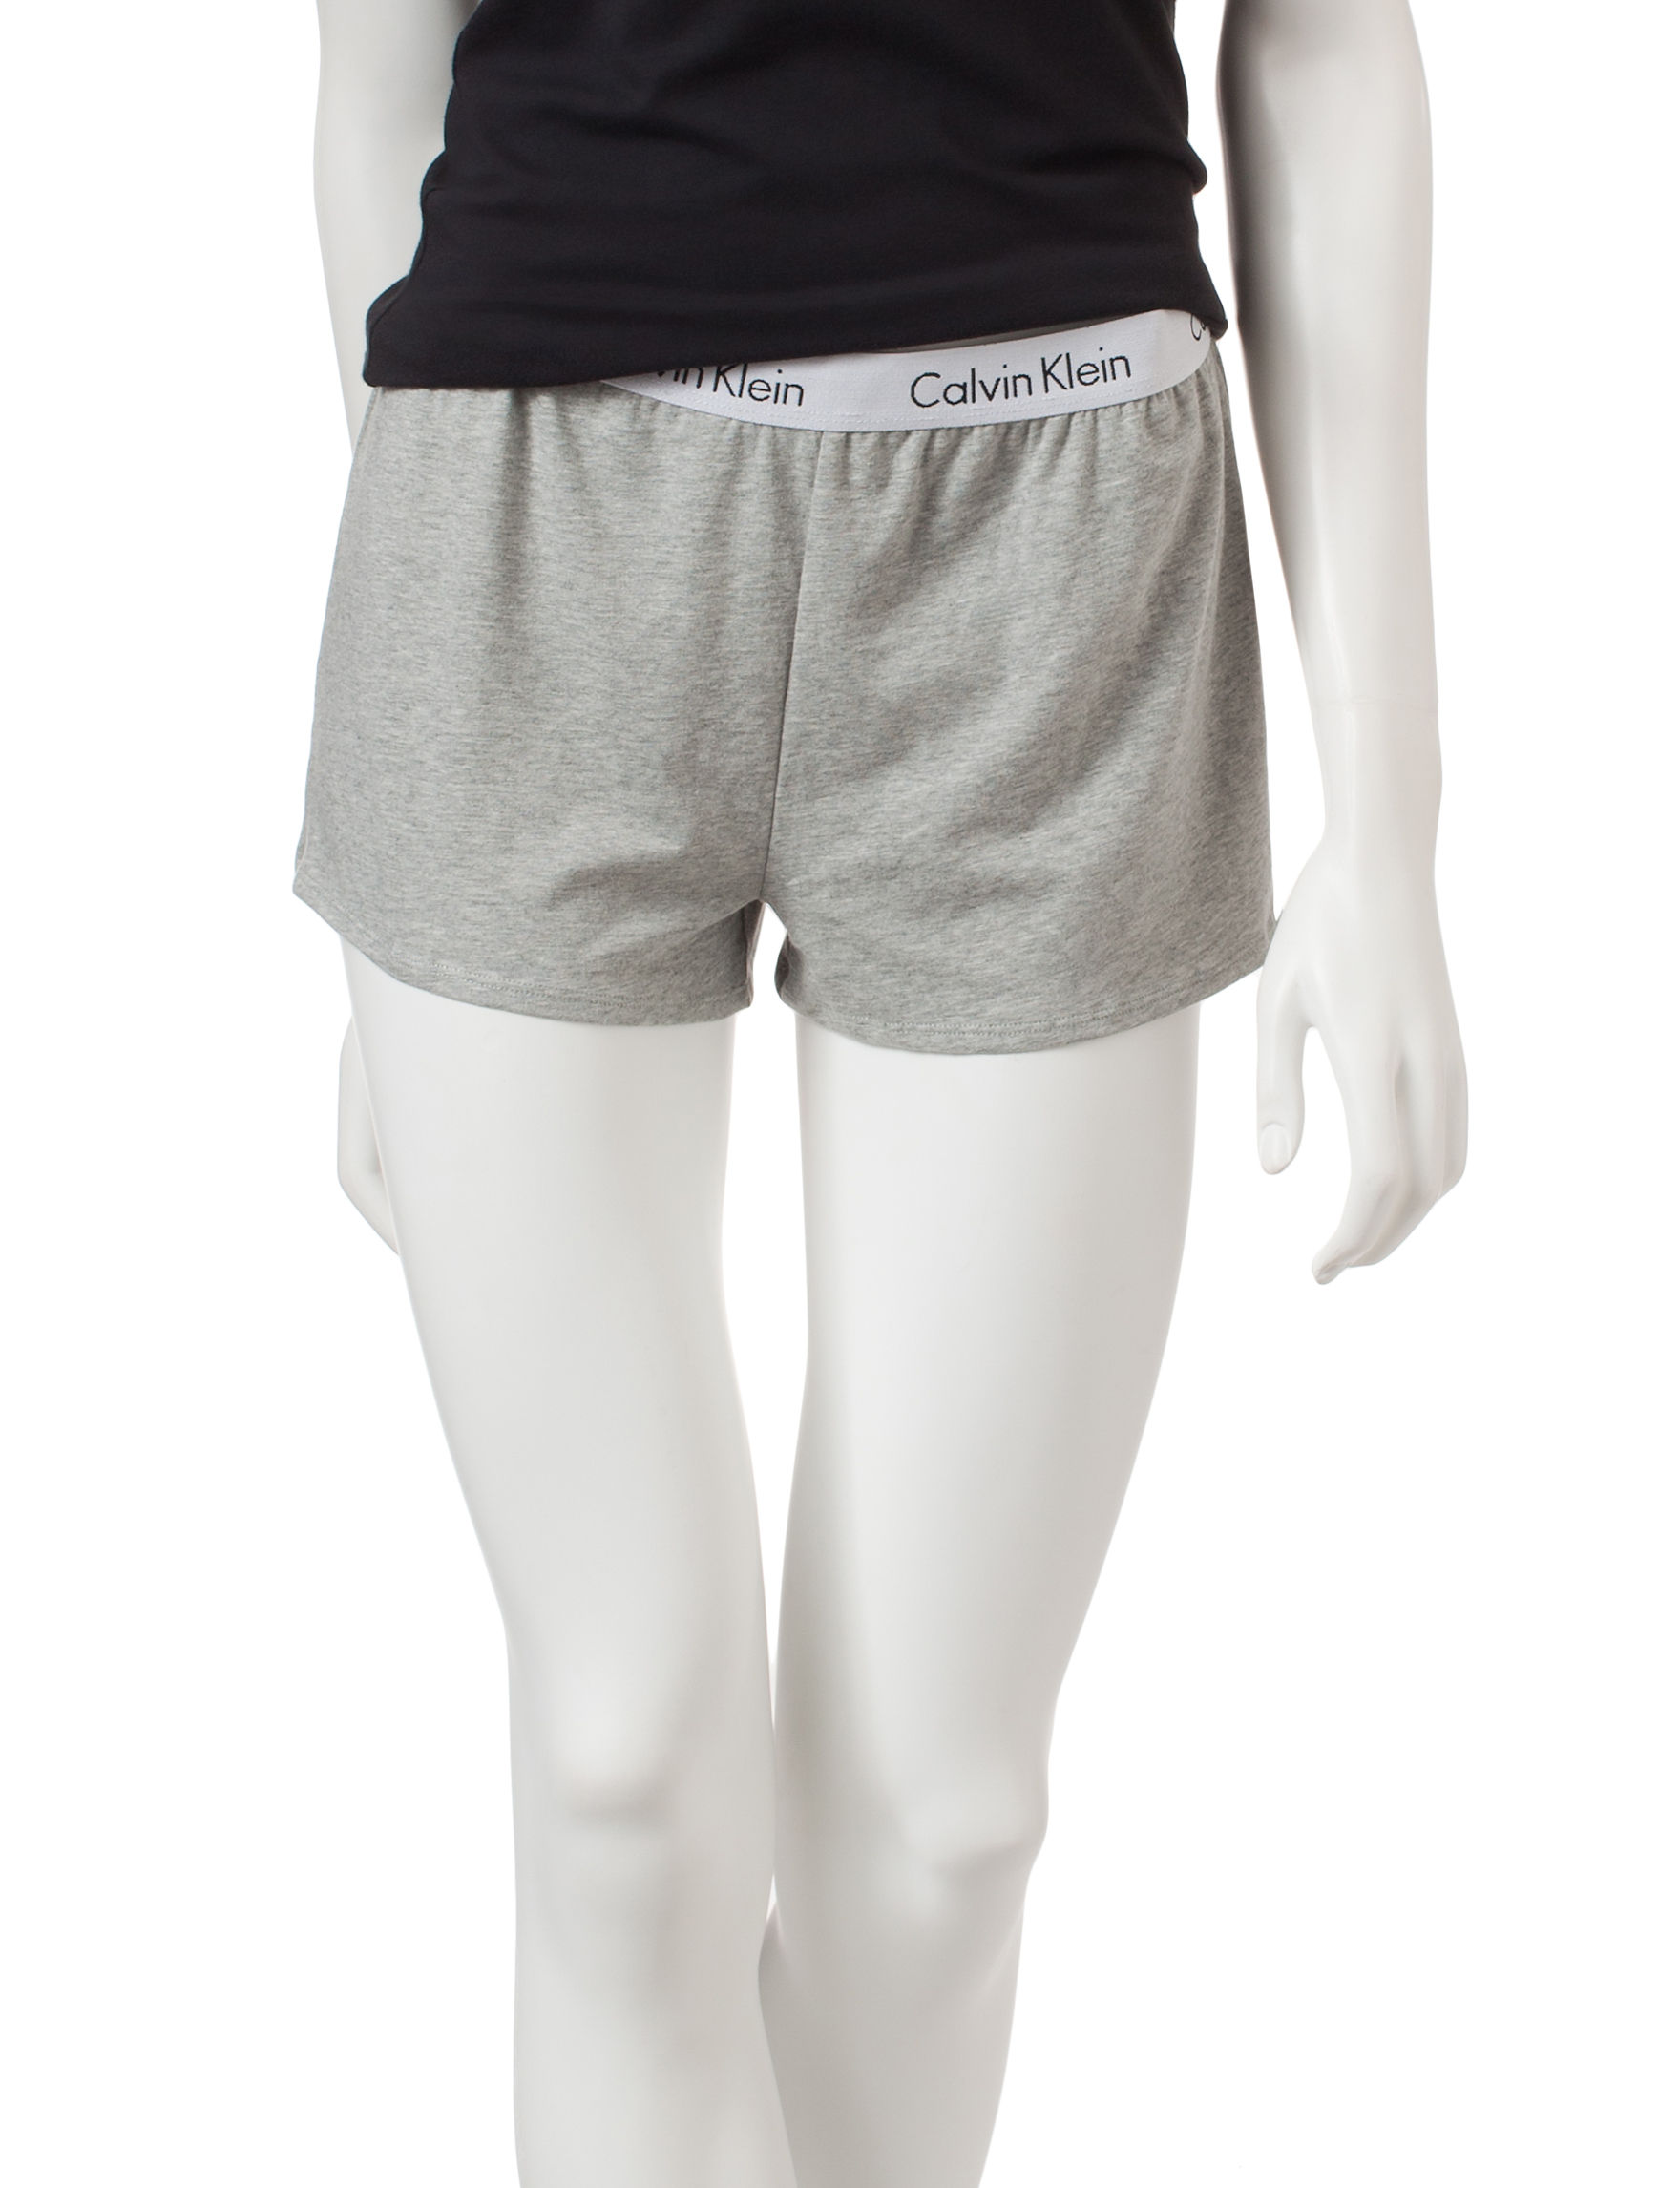 Calvin Klein Heather Grey Pajama Bottoms